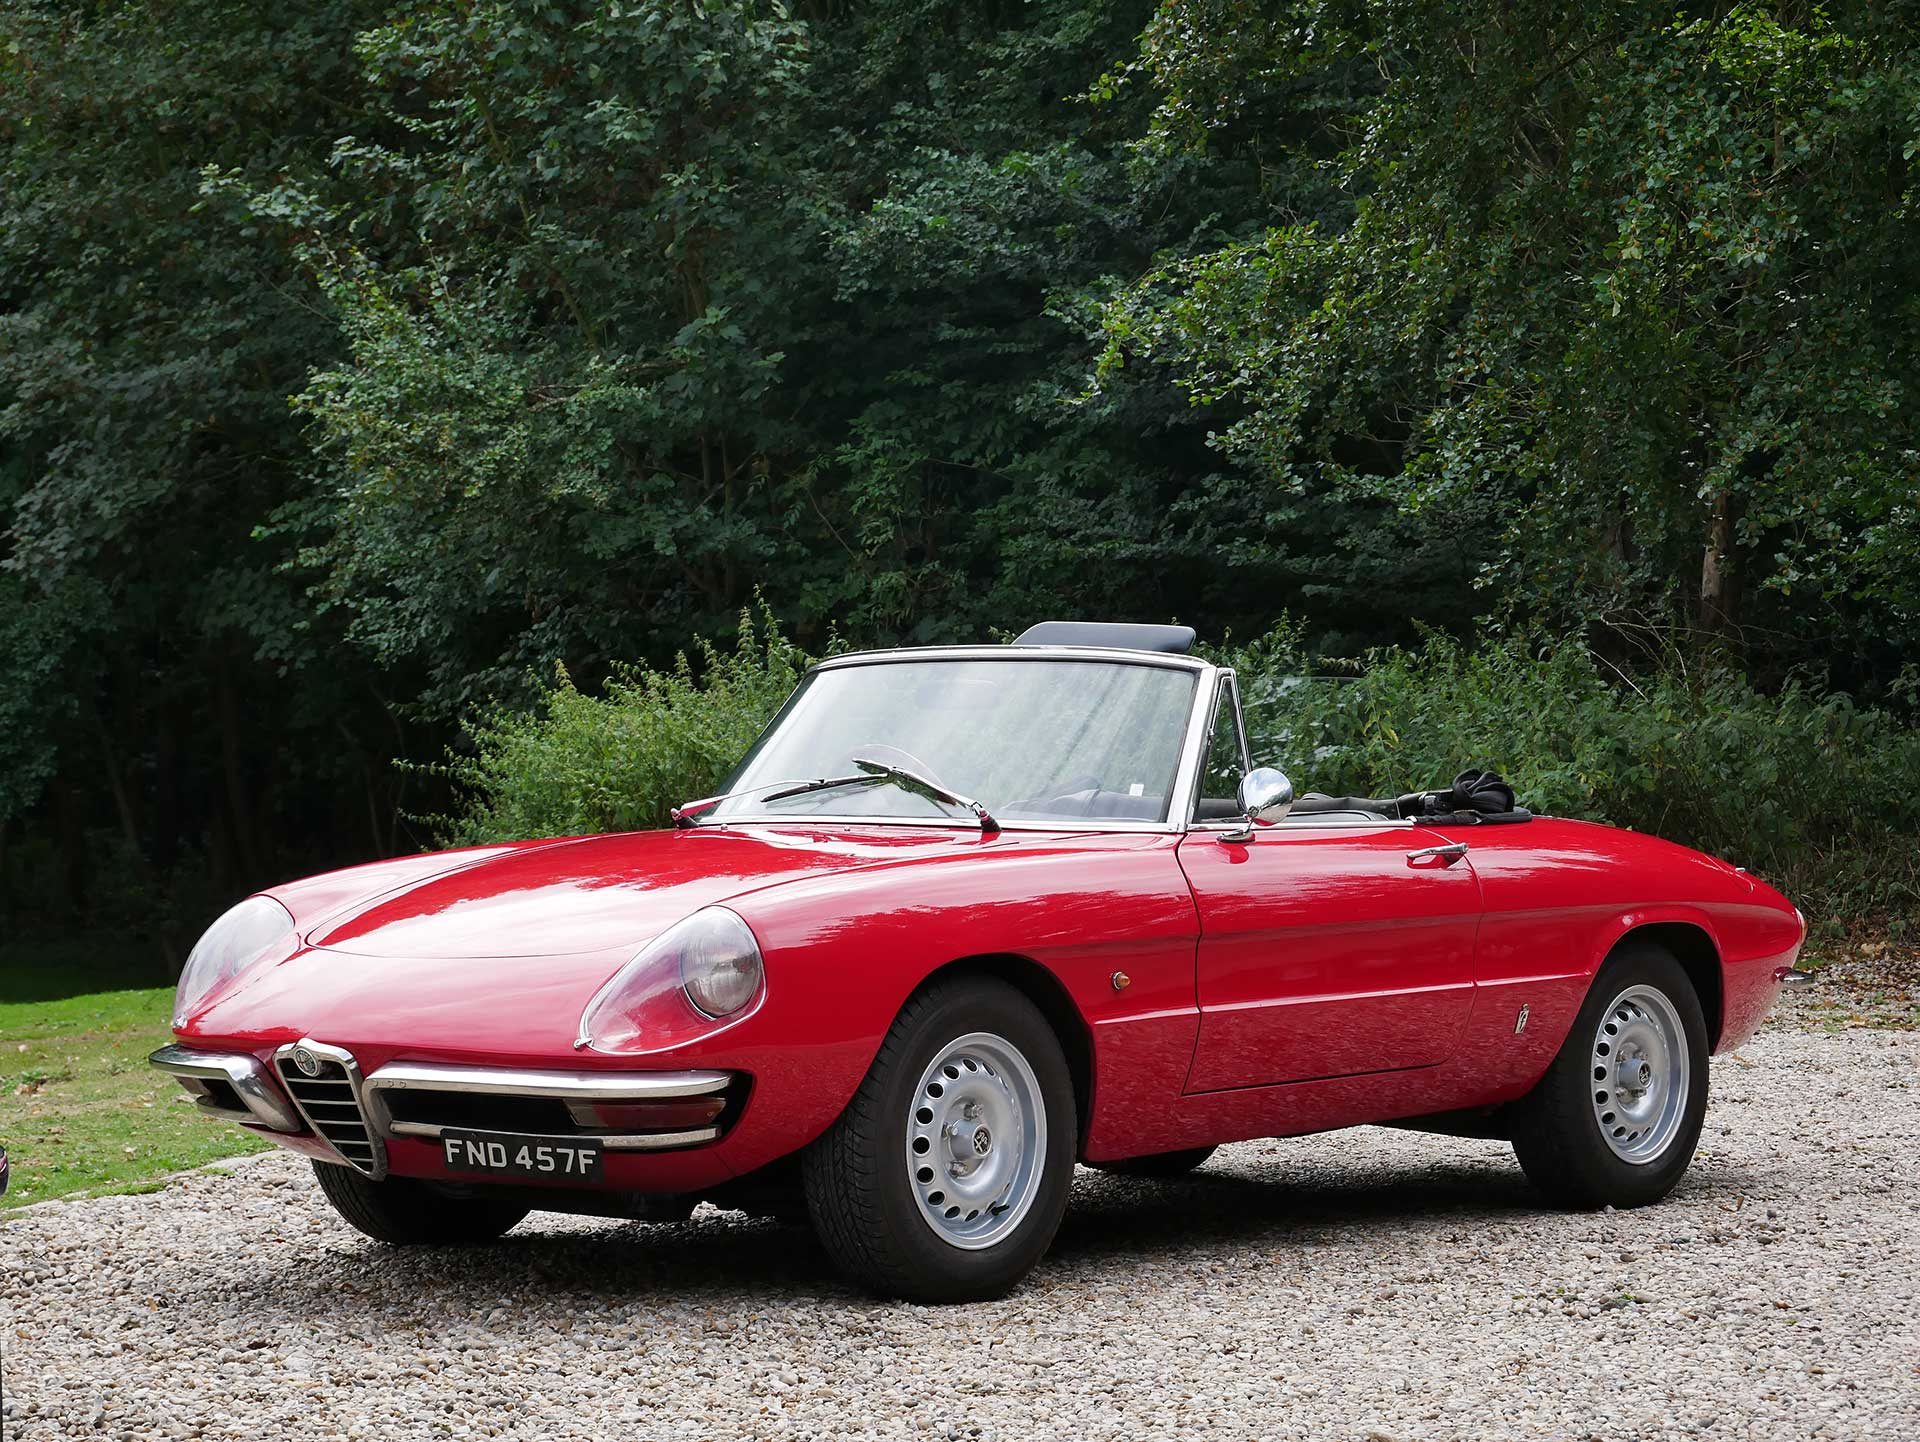 Alfa Romeo Used Car Price Comparison 1972 To 2018 Dan S Things